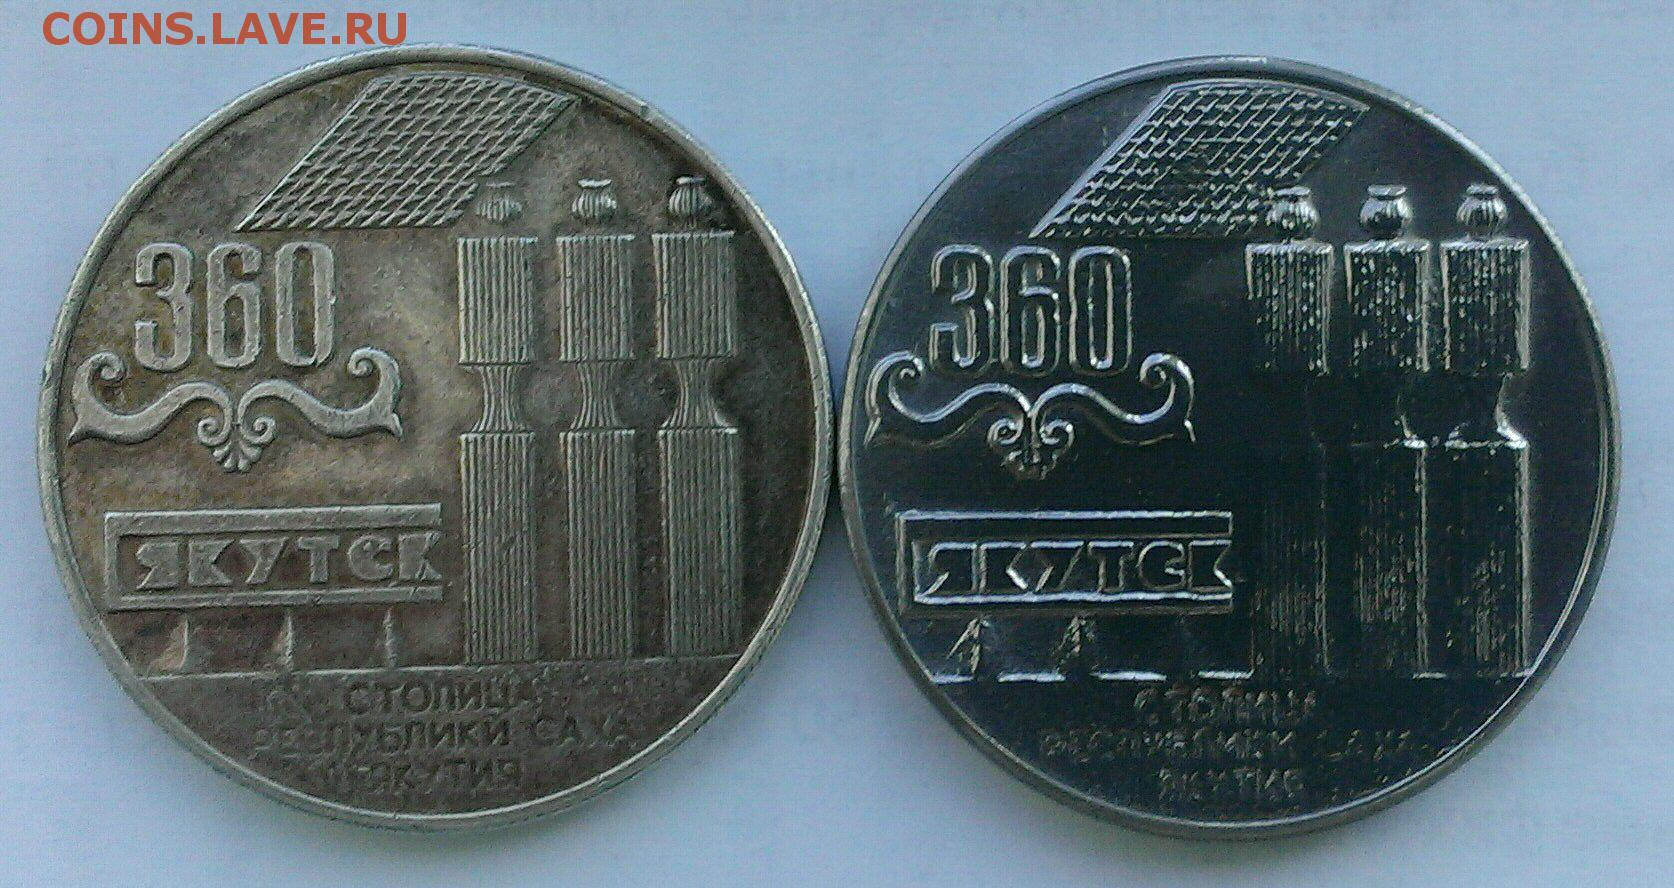 Нумизмат якутск 1 копейка 1949 года цена ссср